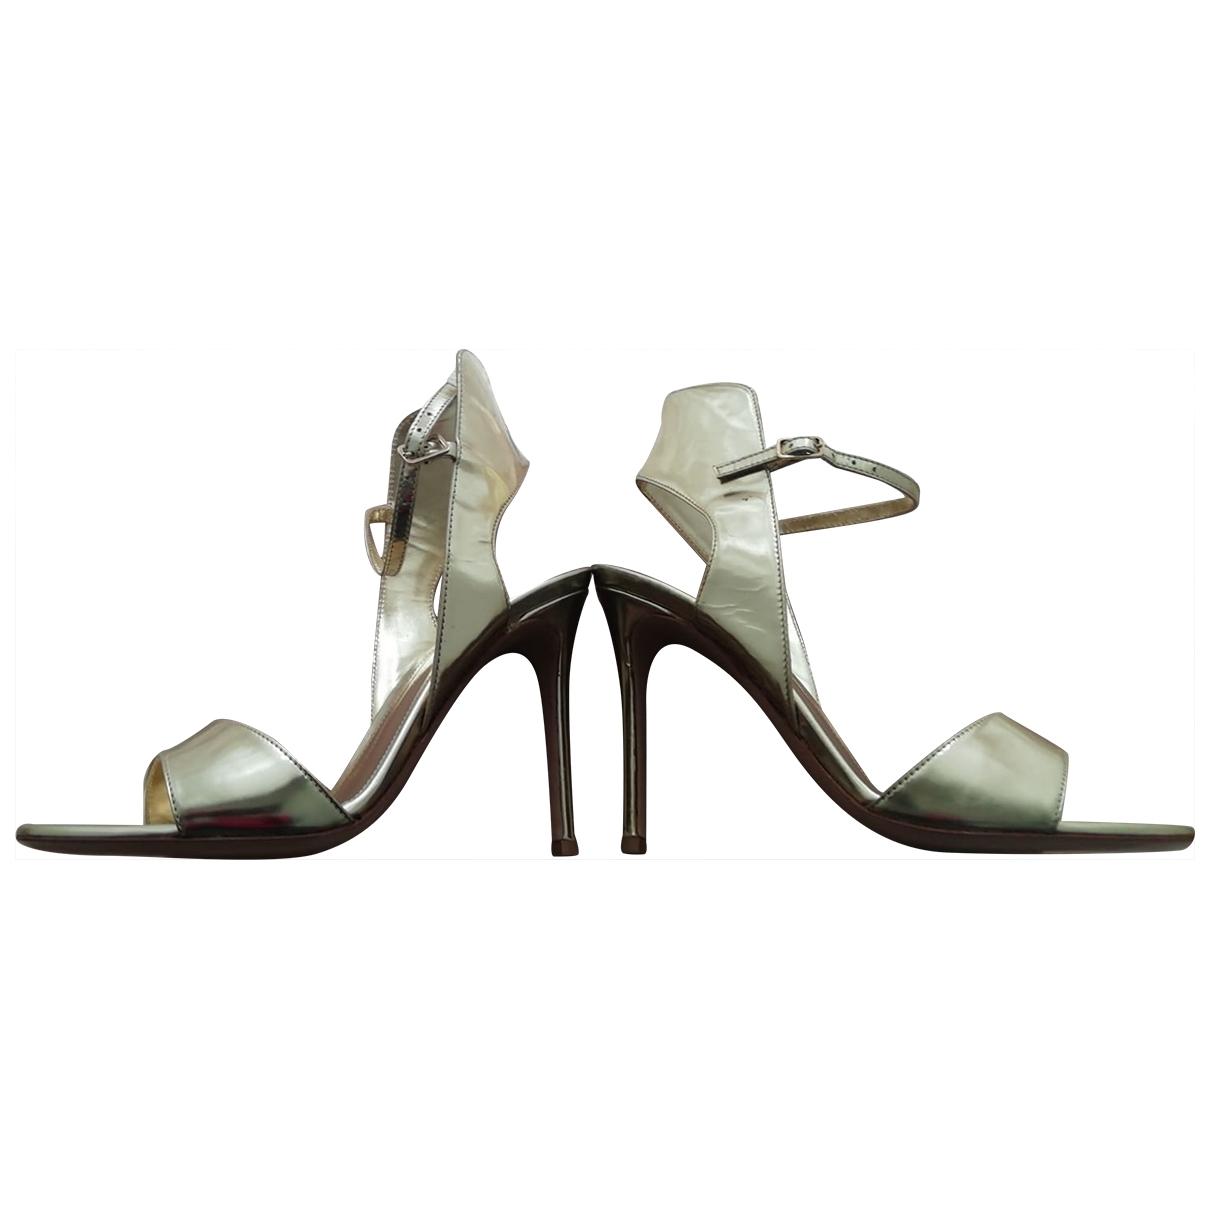 Sandalias de Charol Gianvito Rossi